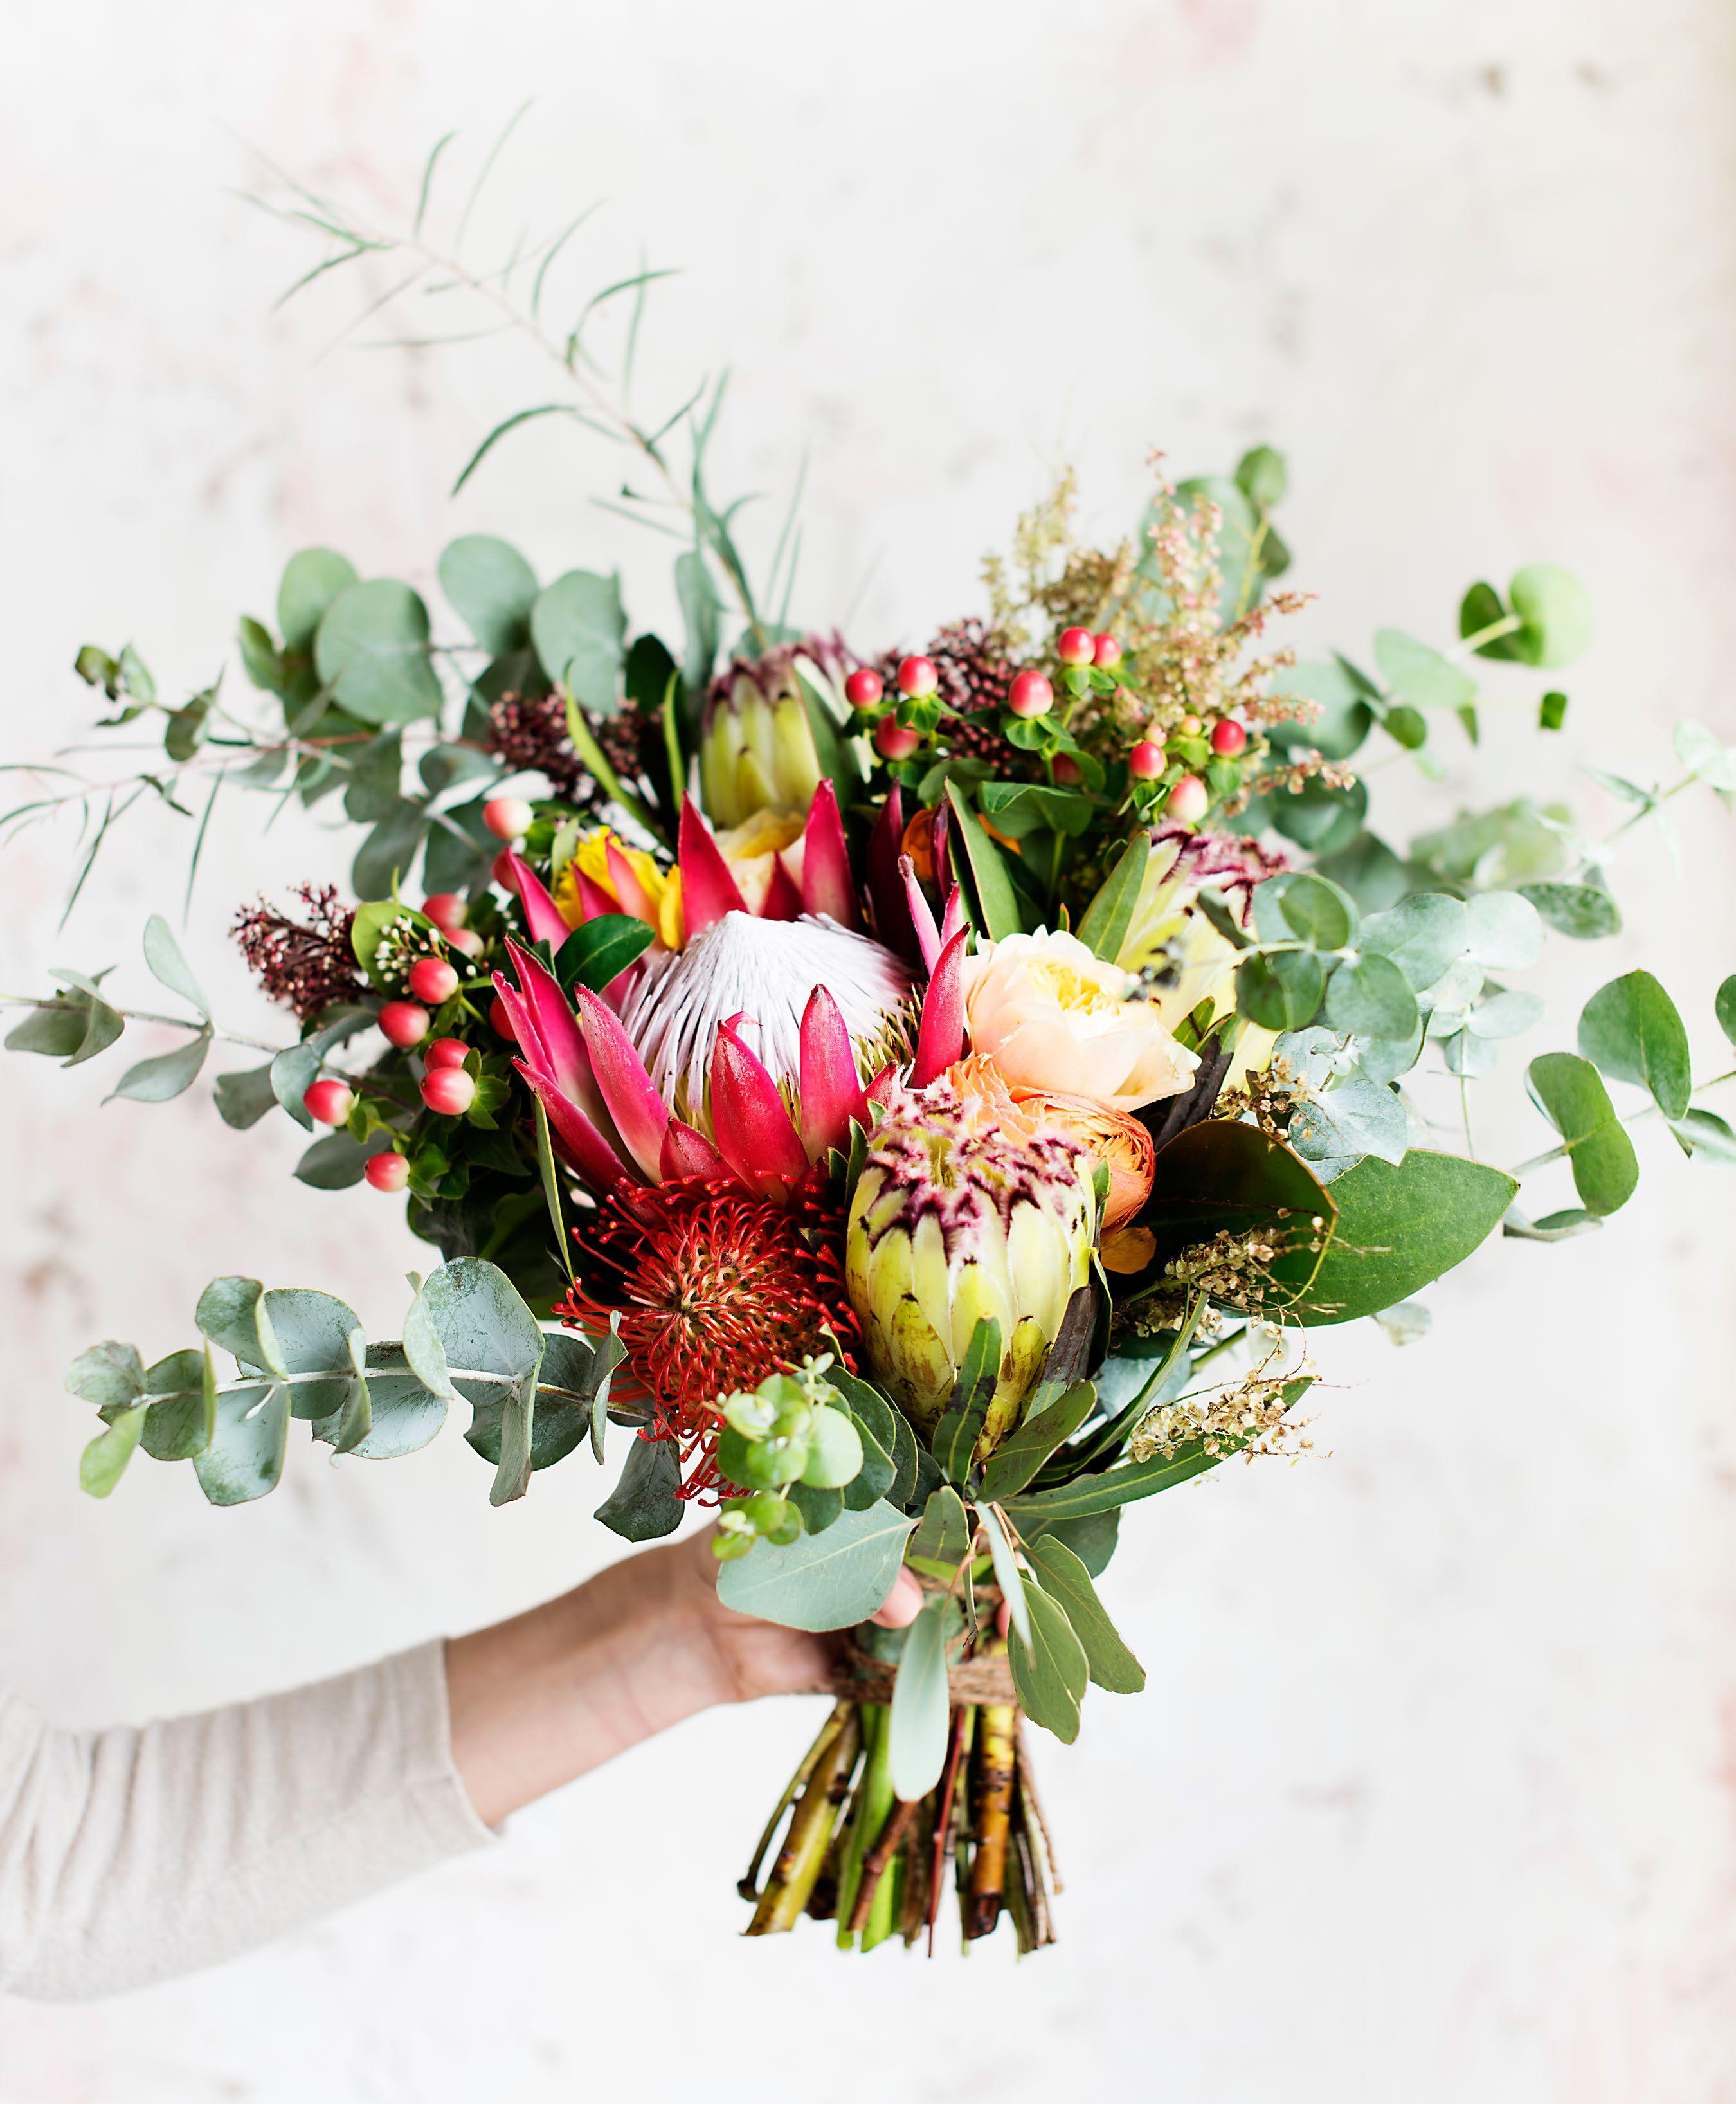 North & Peach Magazine Volume 2 Beautiful bouquet of